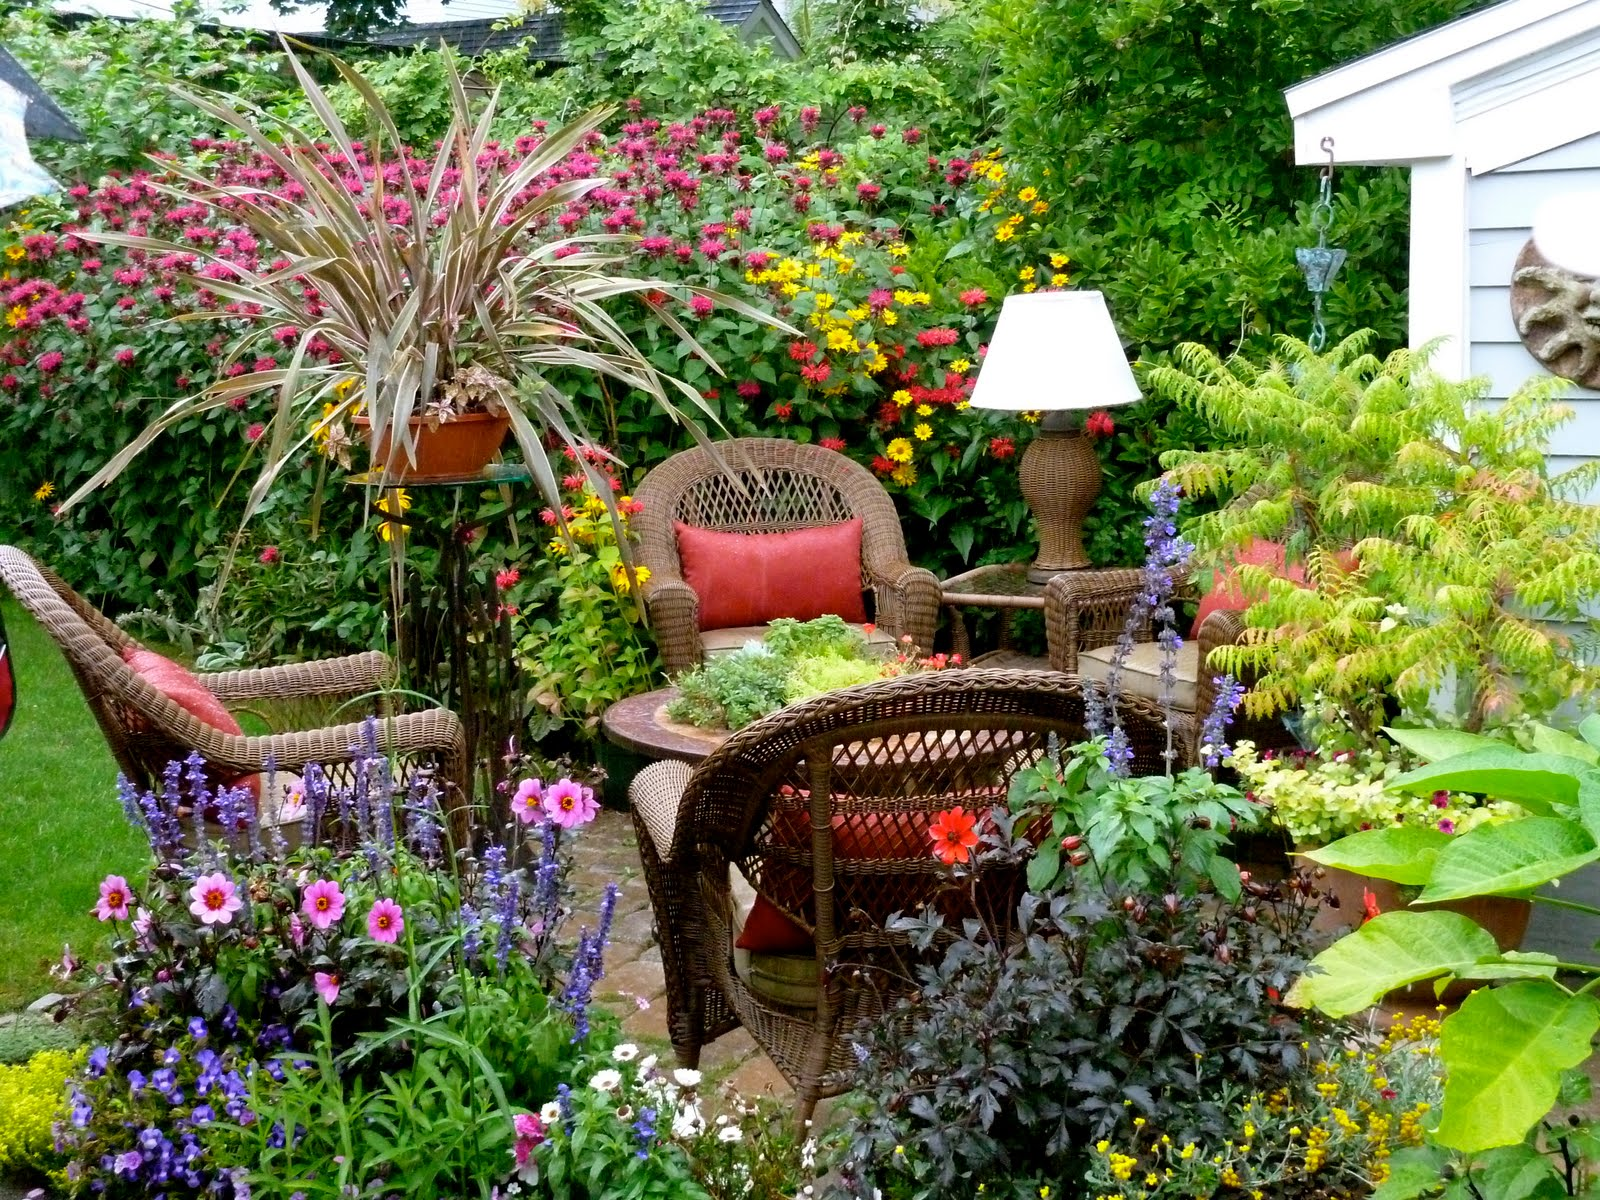 clay and limestone: Big Ideas From Small Gardens ~Buffa10 on Tiny Back Garden Ideas id=78379